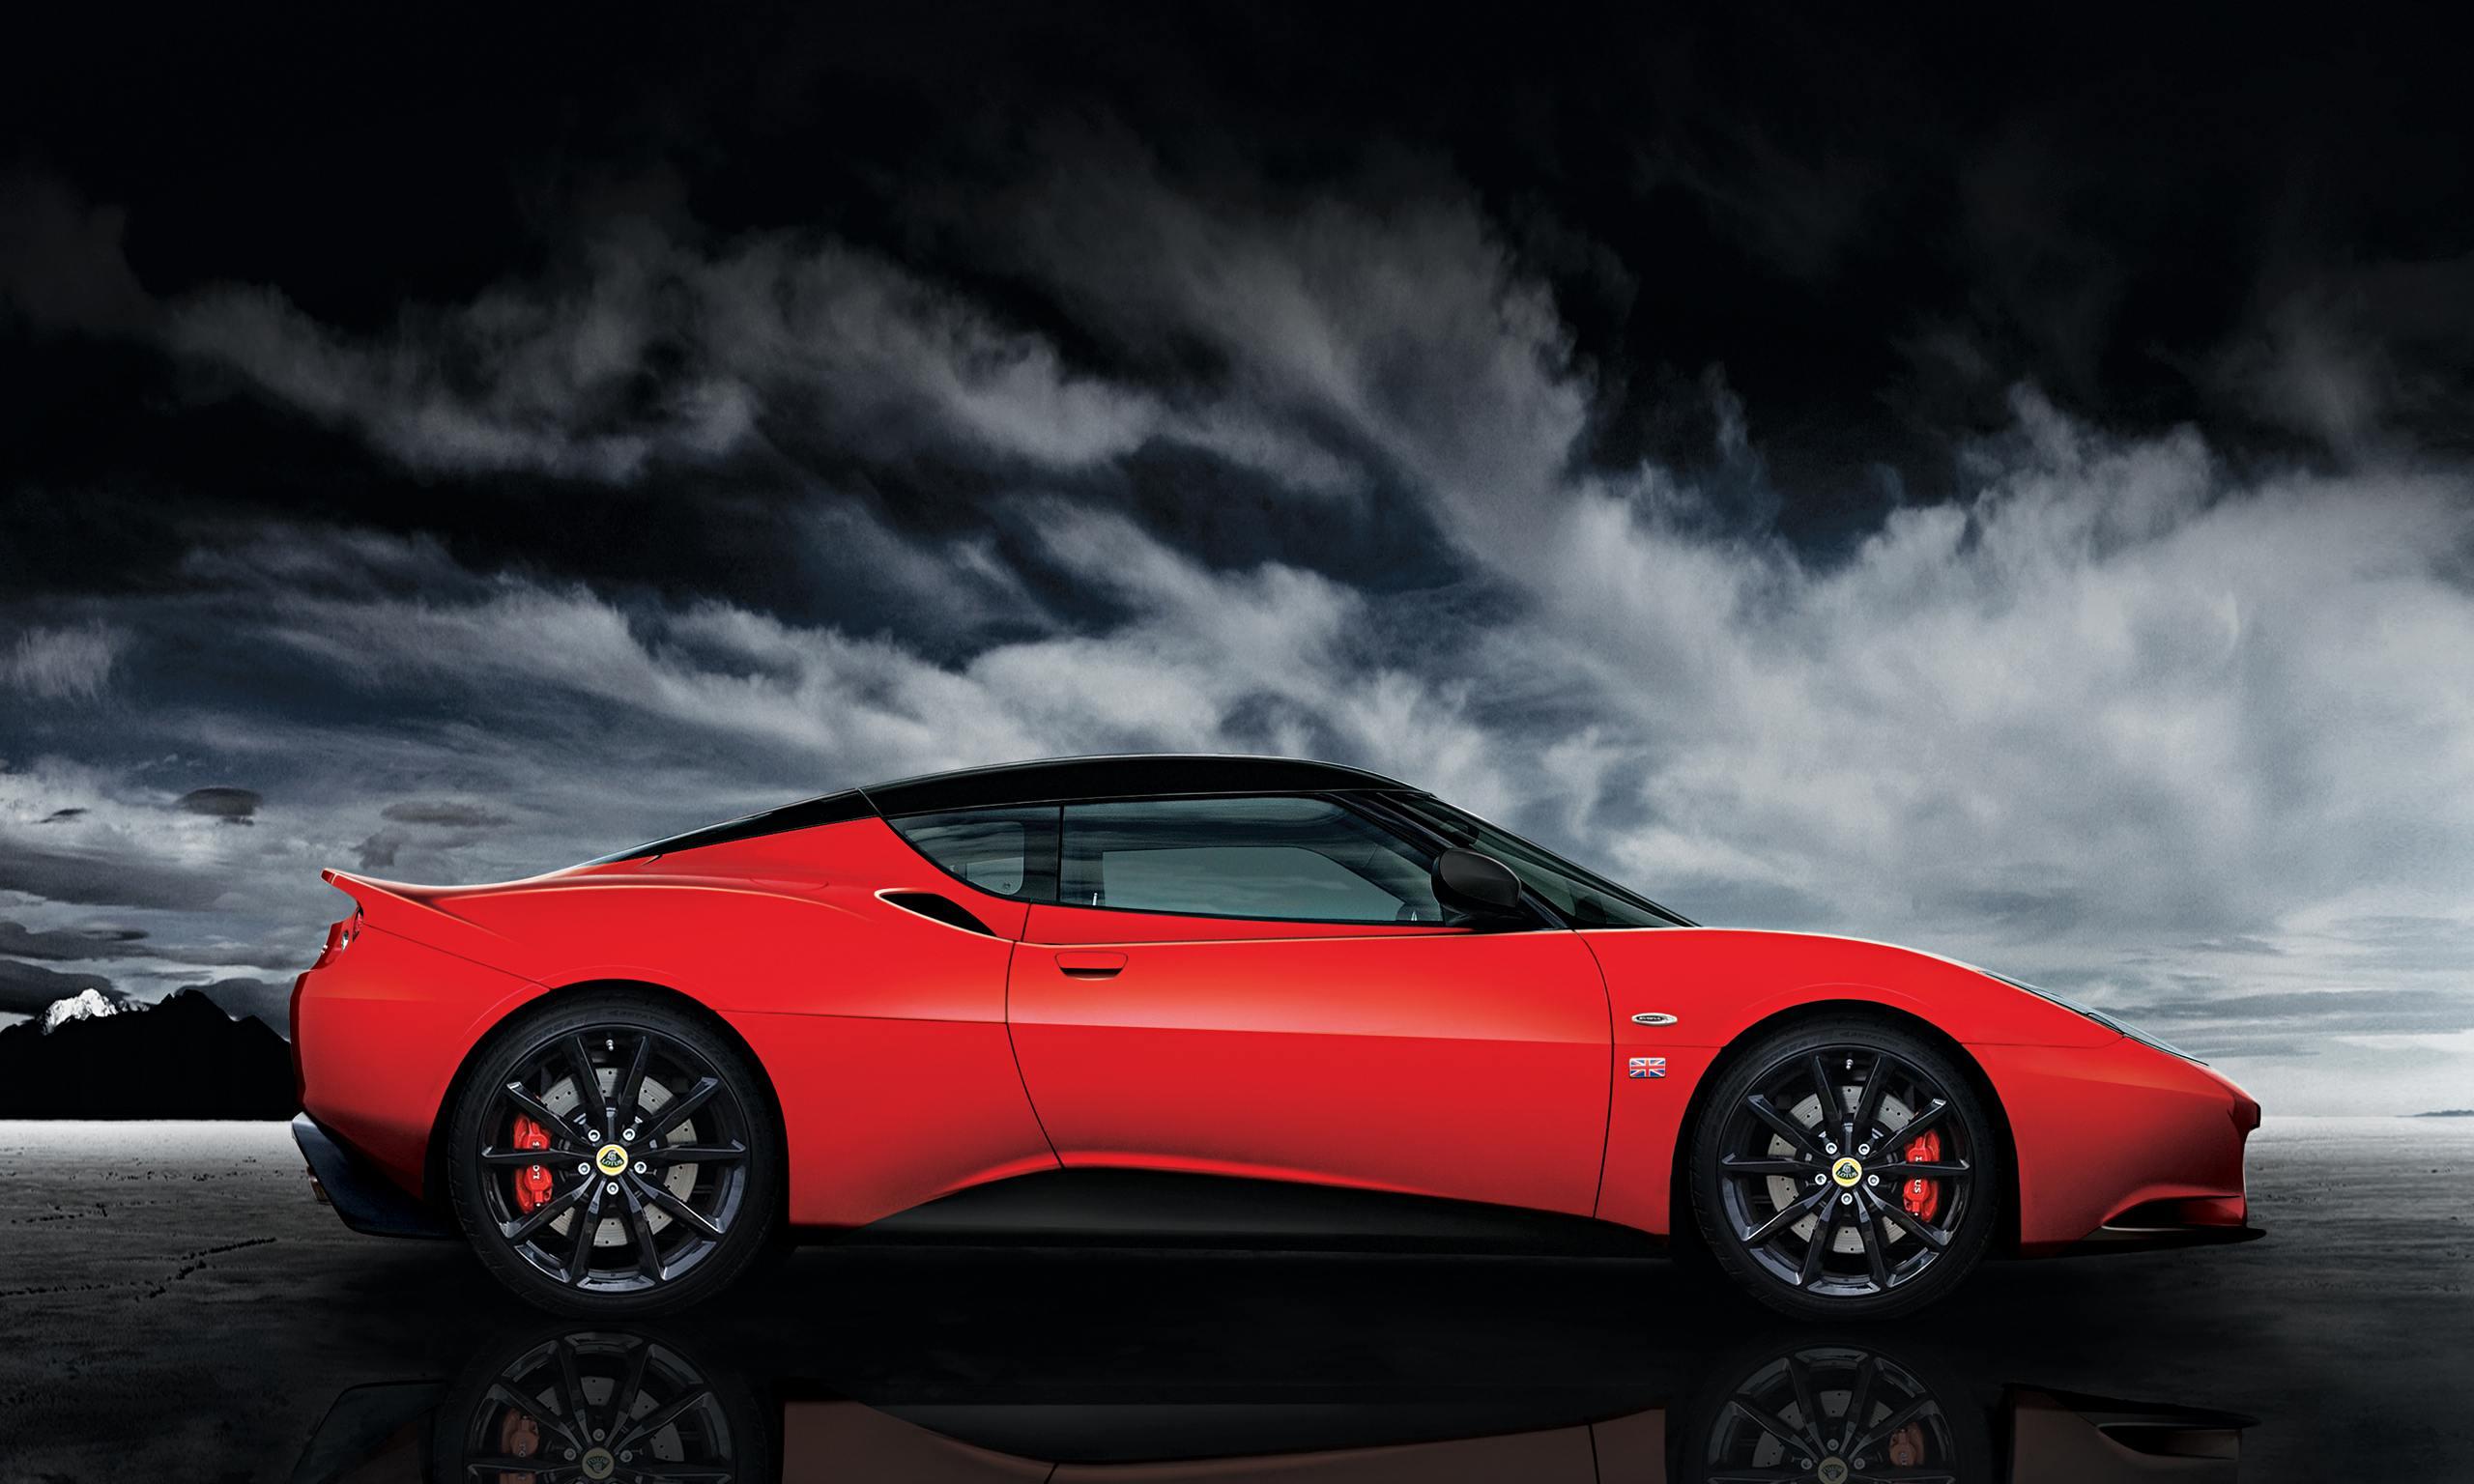 lotus evora car review martin love technology the. Black Bedroom Furniture Sets. Home Design Ideas